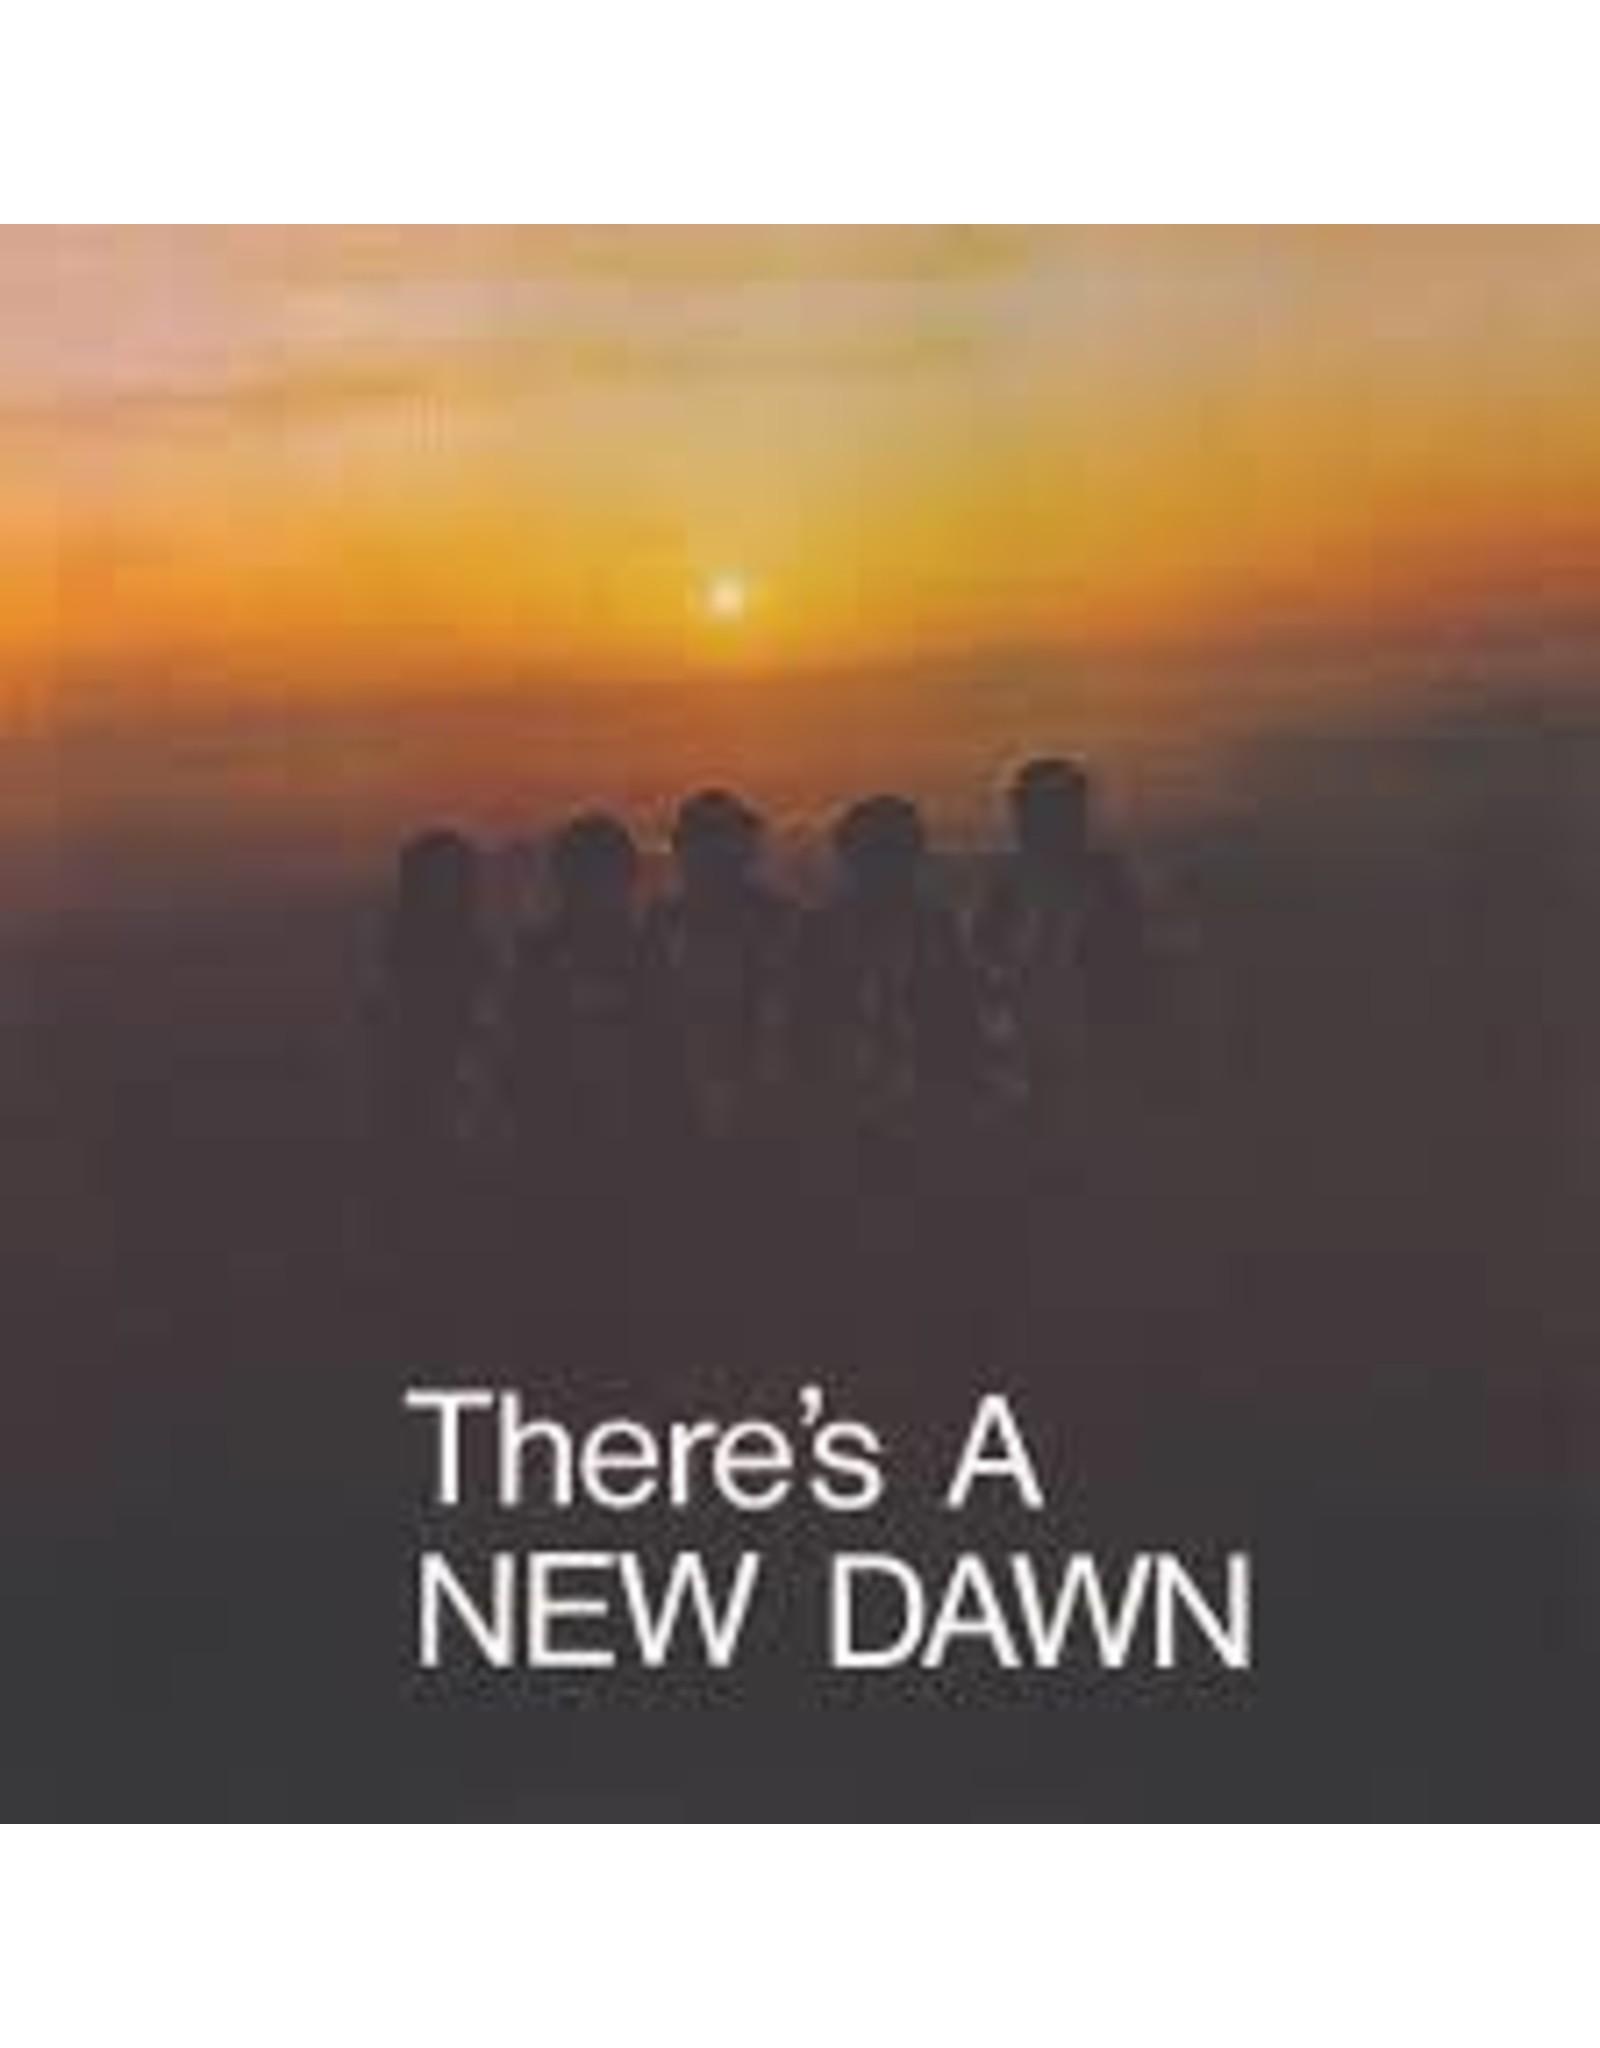 Vinyl New Dawn - There's A New Dawn